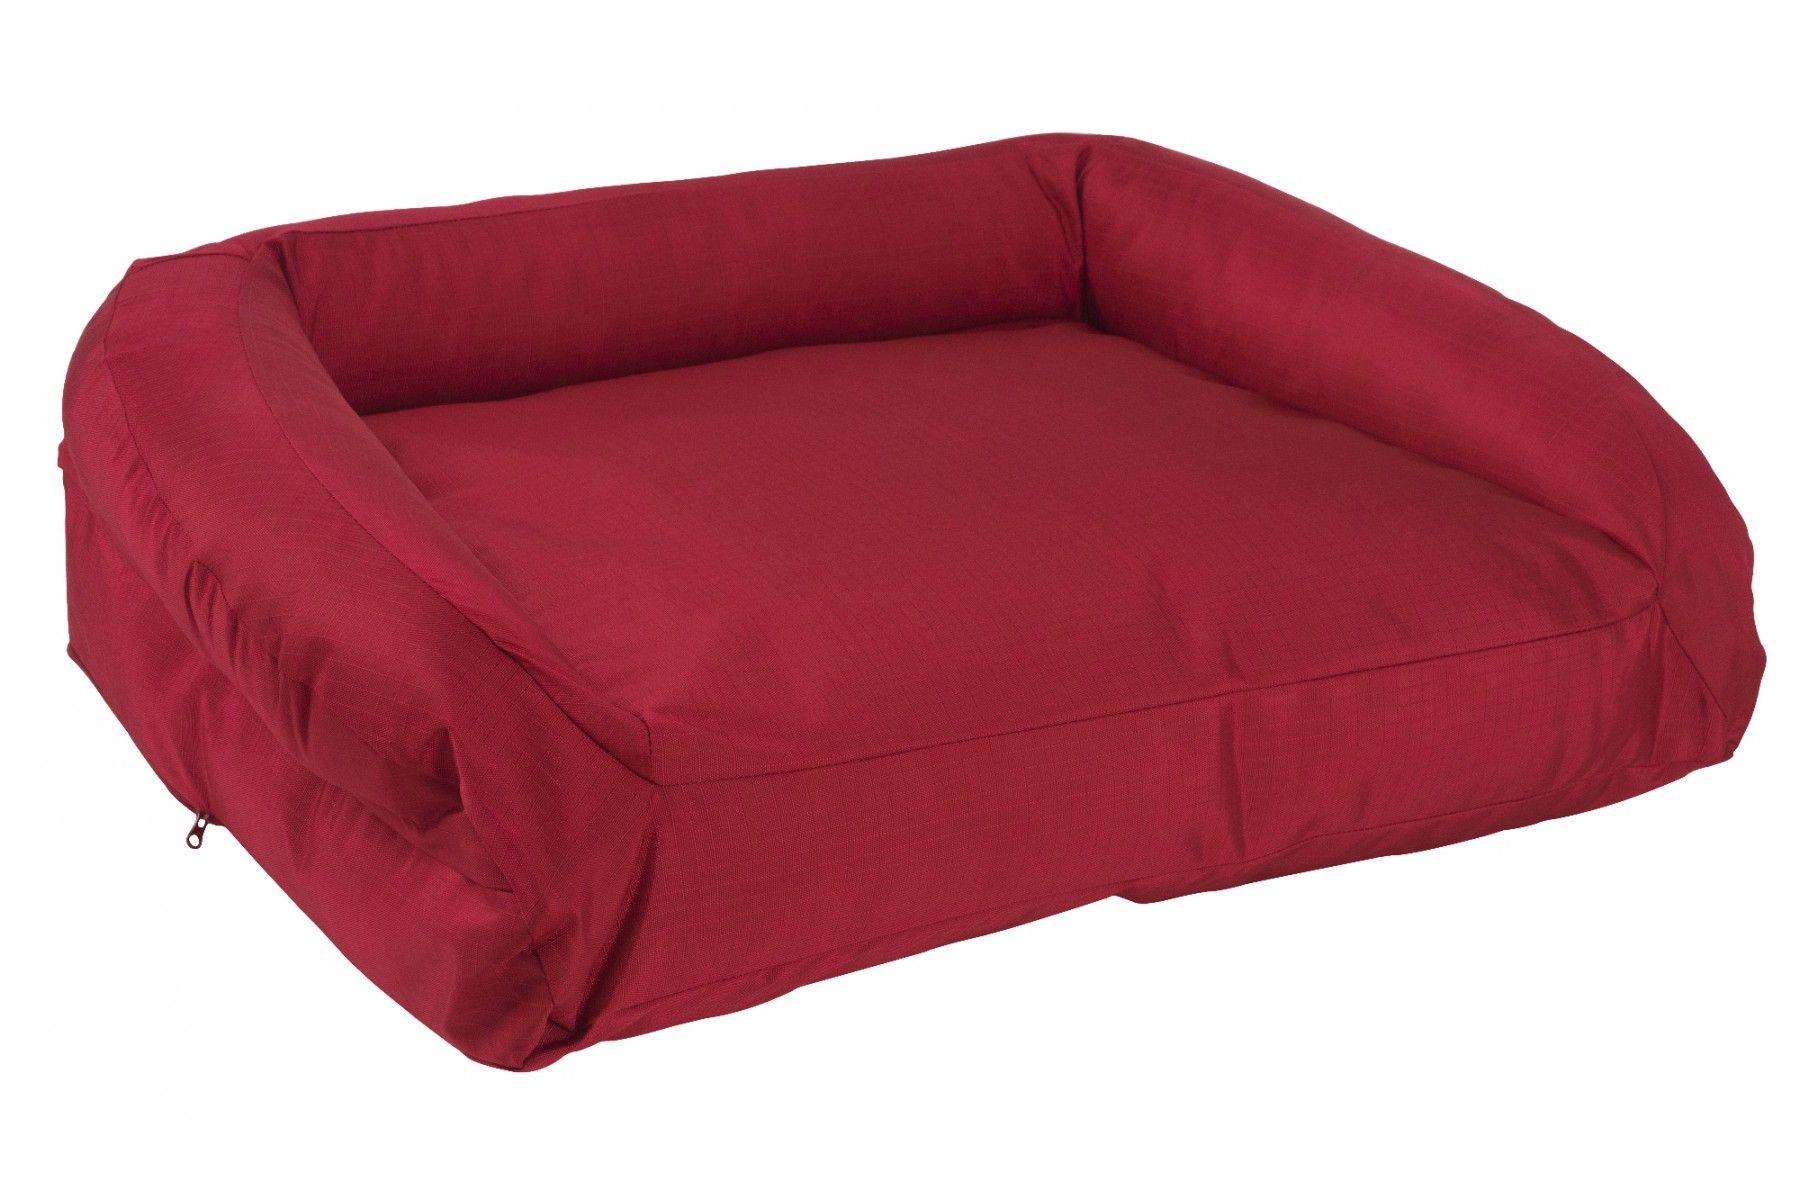 Tough Bolstered Nesting Dog Beds K9 Ballistics Dog Bed Washable Dog Bed Waterproof Dog Bed